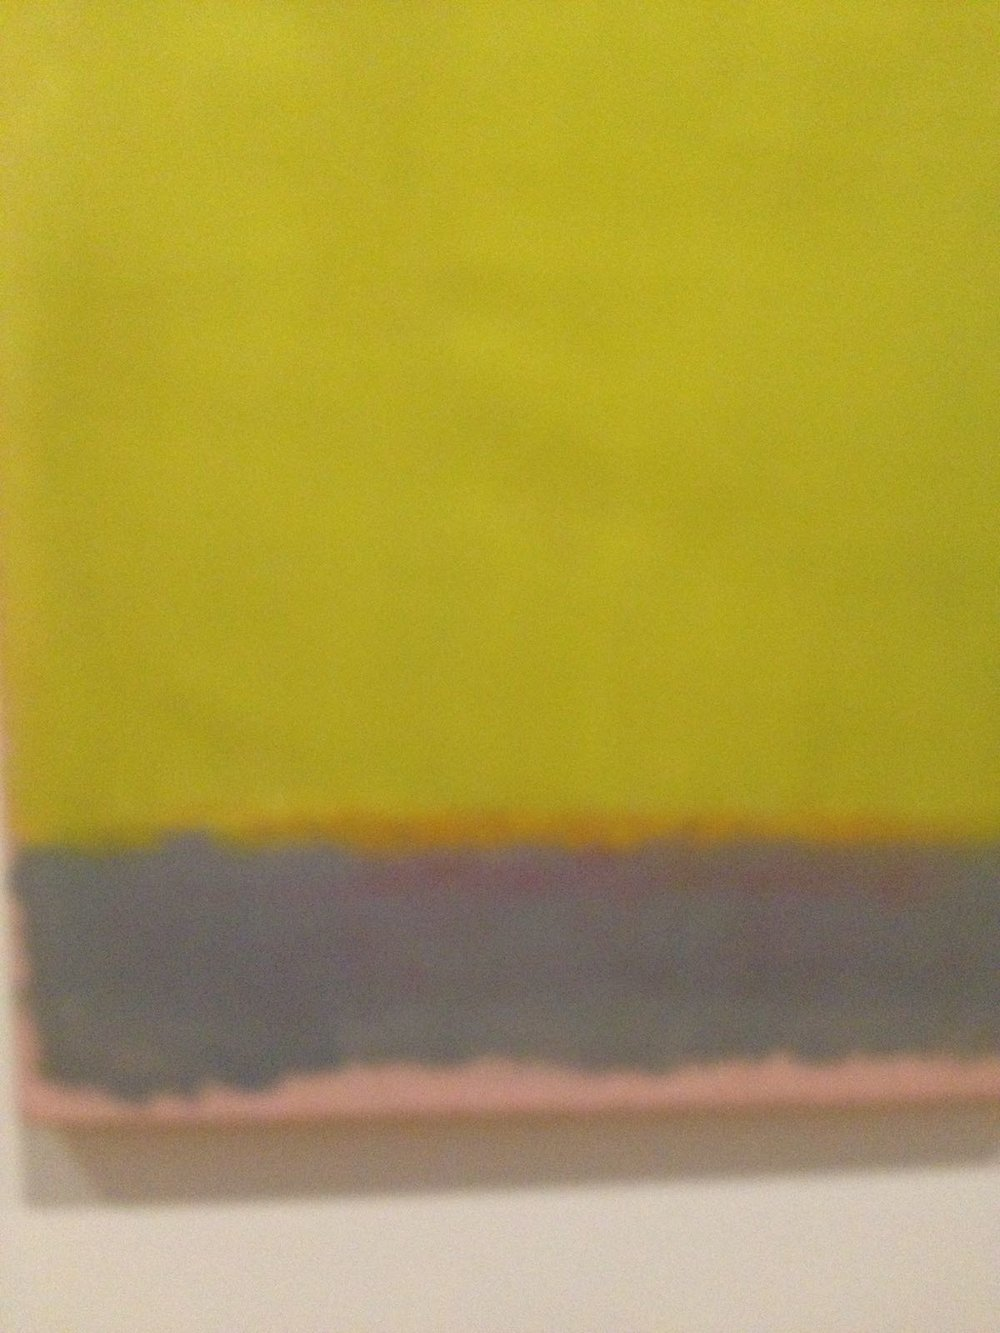 Rothko, detail